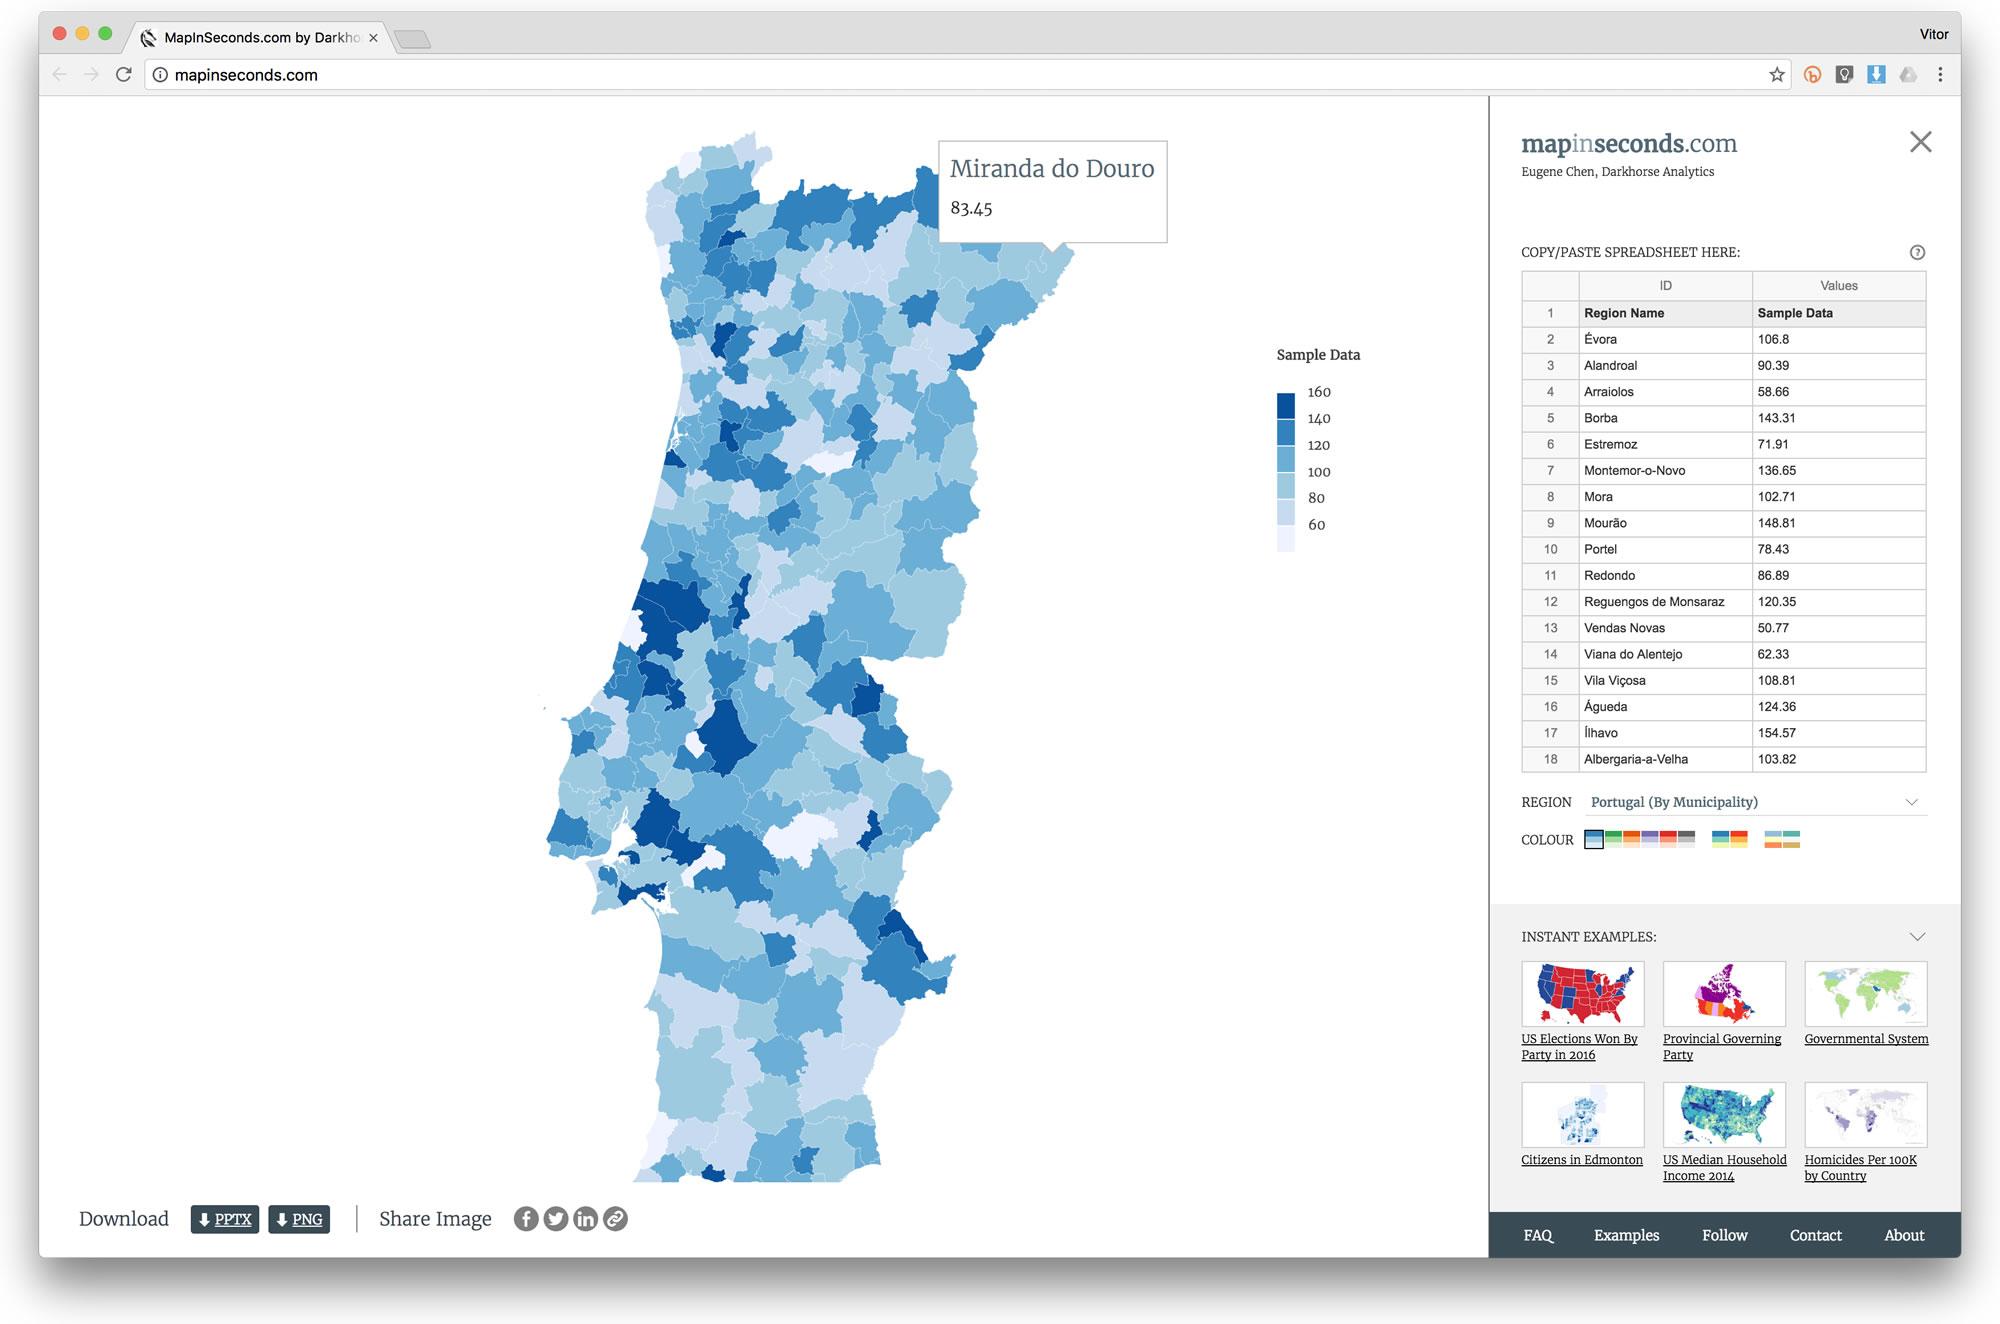 Como Fazer Mapas Estatisticos Interactivos De Forma Simples Pplware